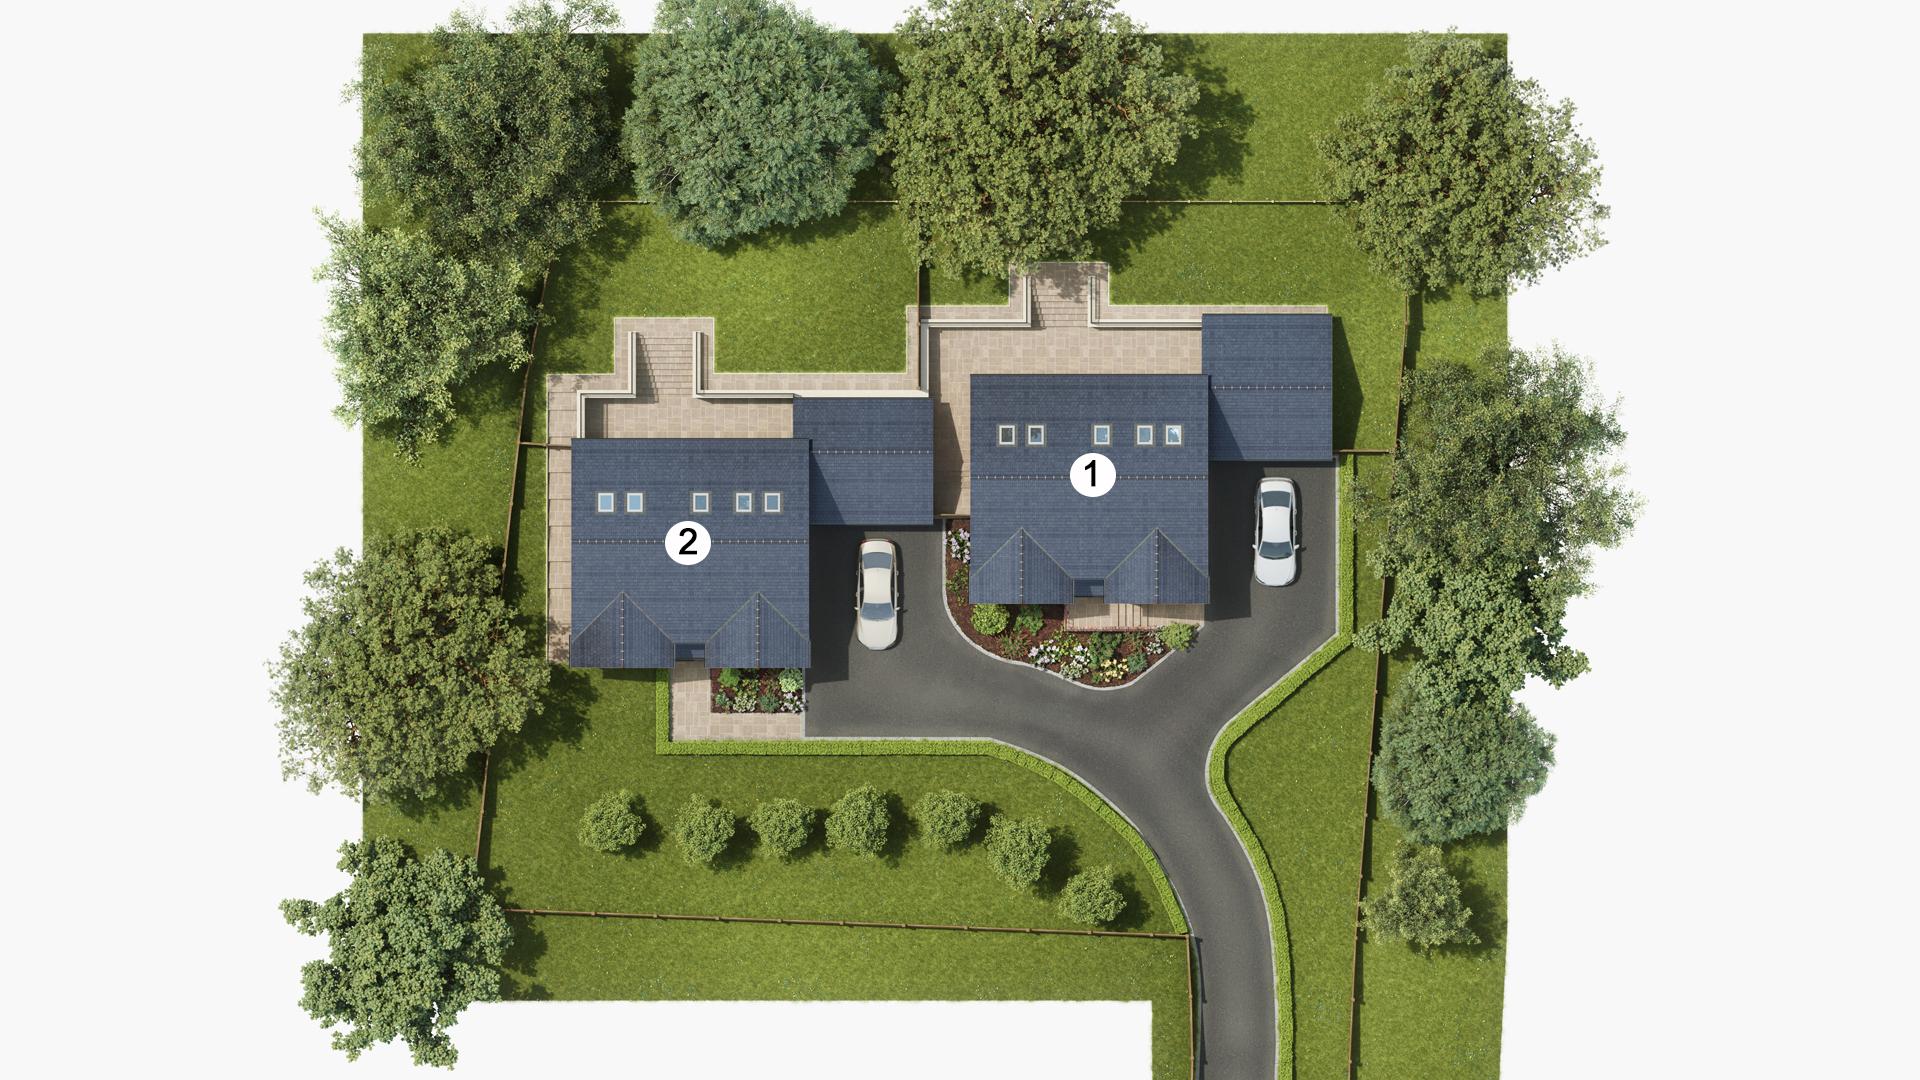 Chestnut View – Plot 2 site plan